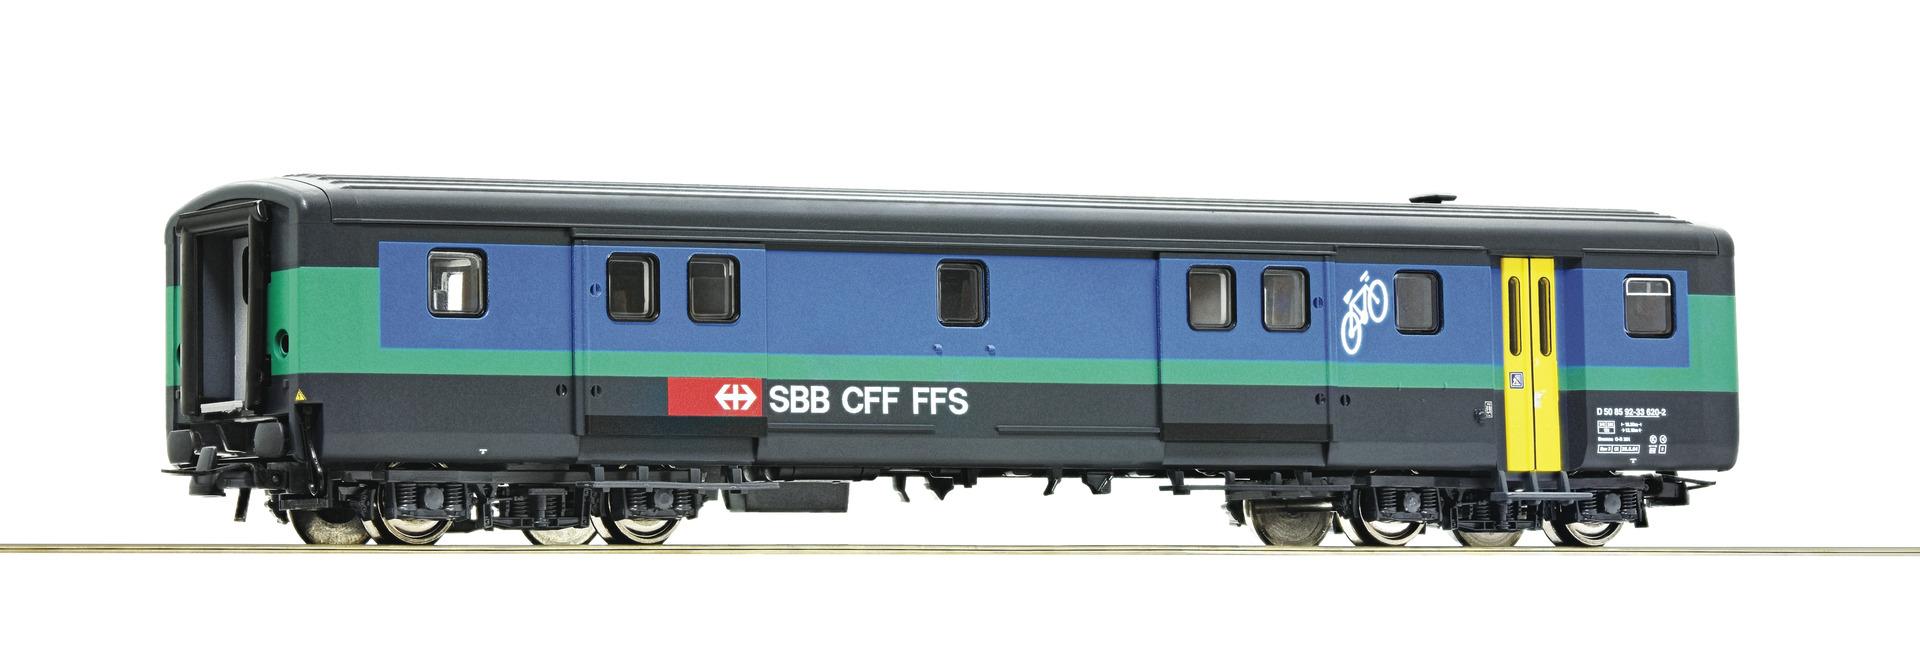 Roco 74568 Gepäckwagen